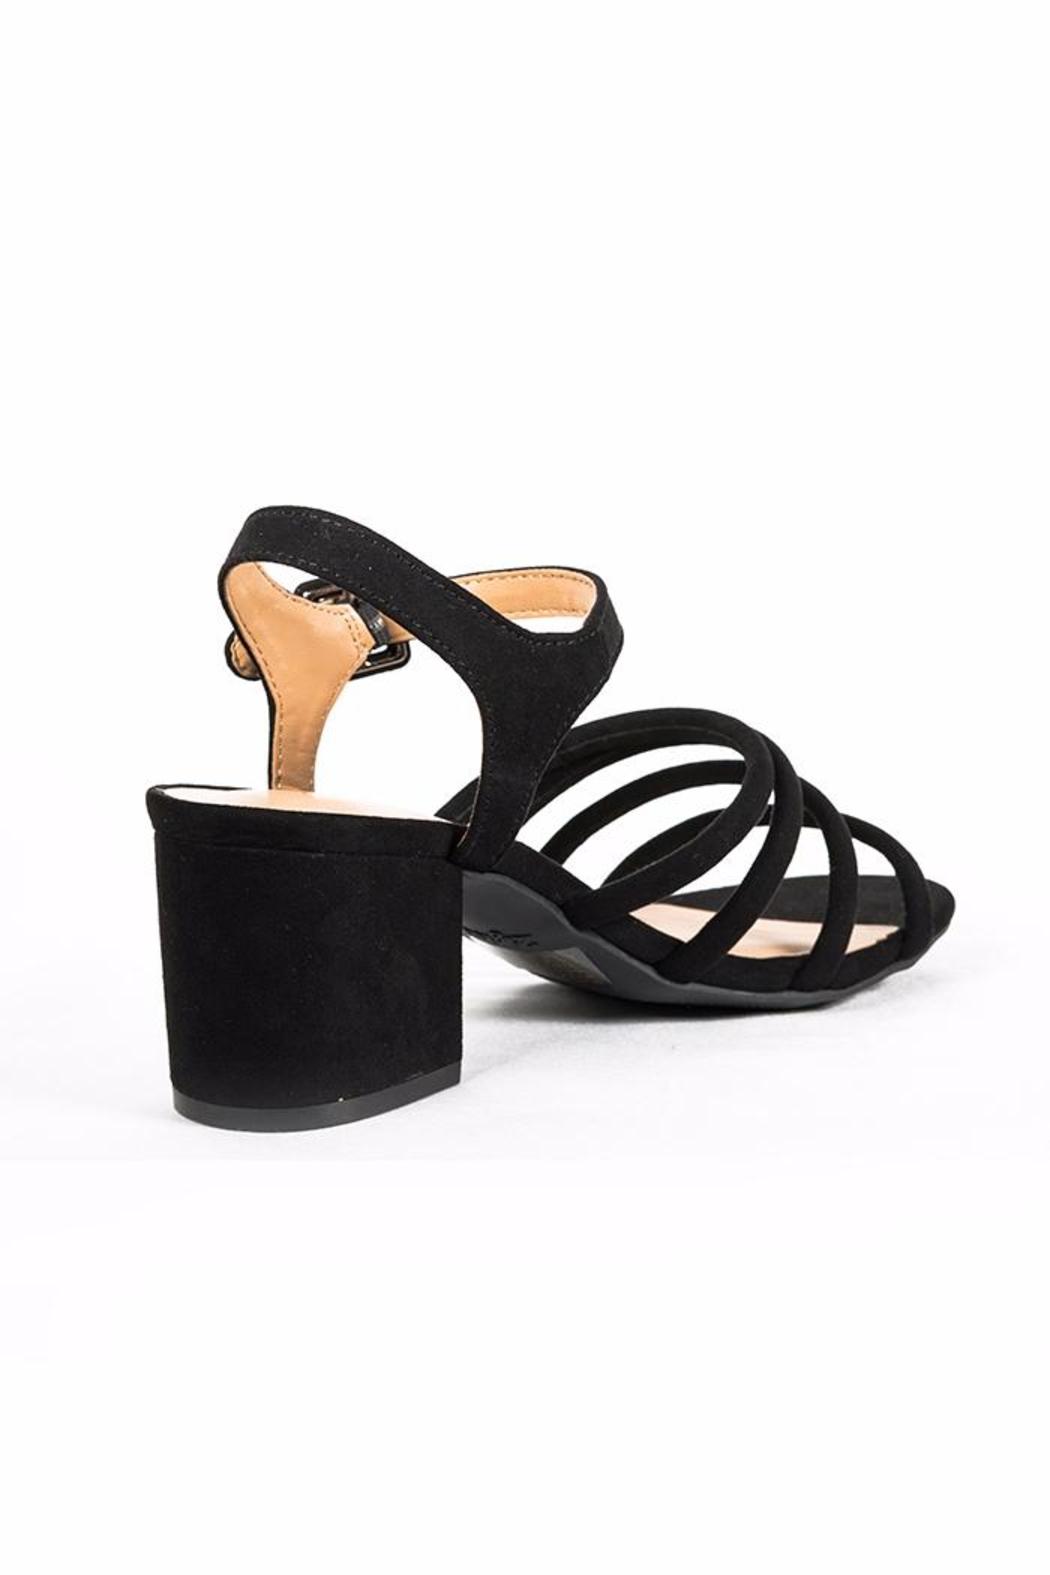 58f30f1cdce ZIGI SOHO Womens gladys Open Toe Casual Strappy Sandals